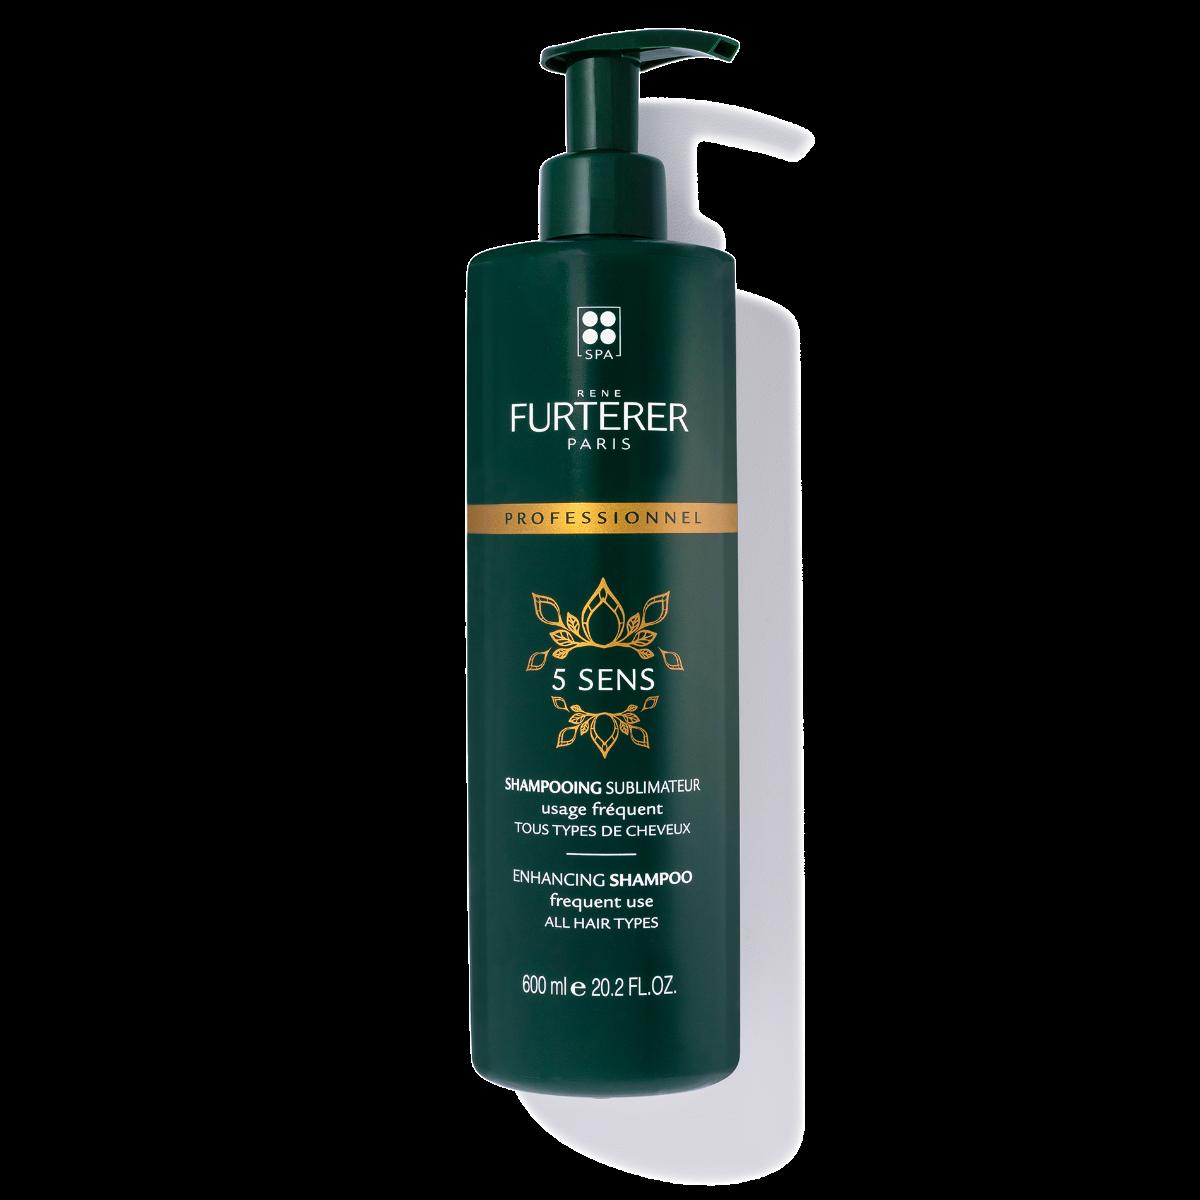 Rene Furterer 5 Sens Enhancing Shampoo